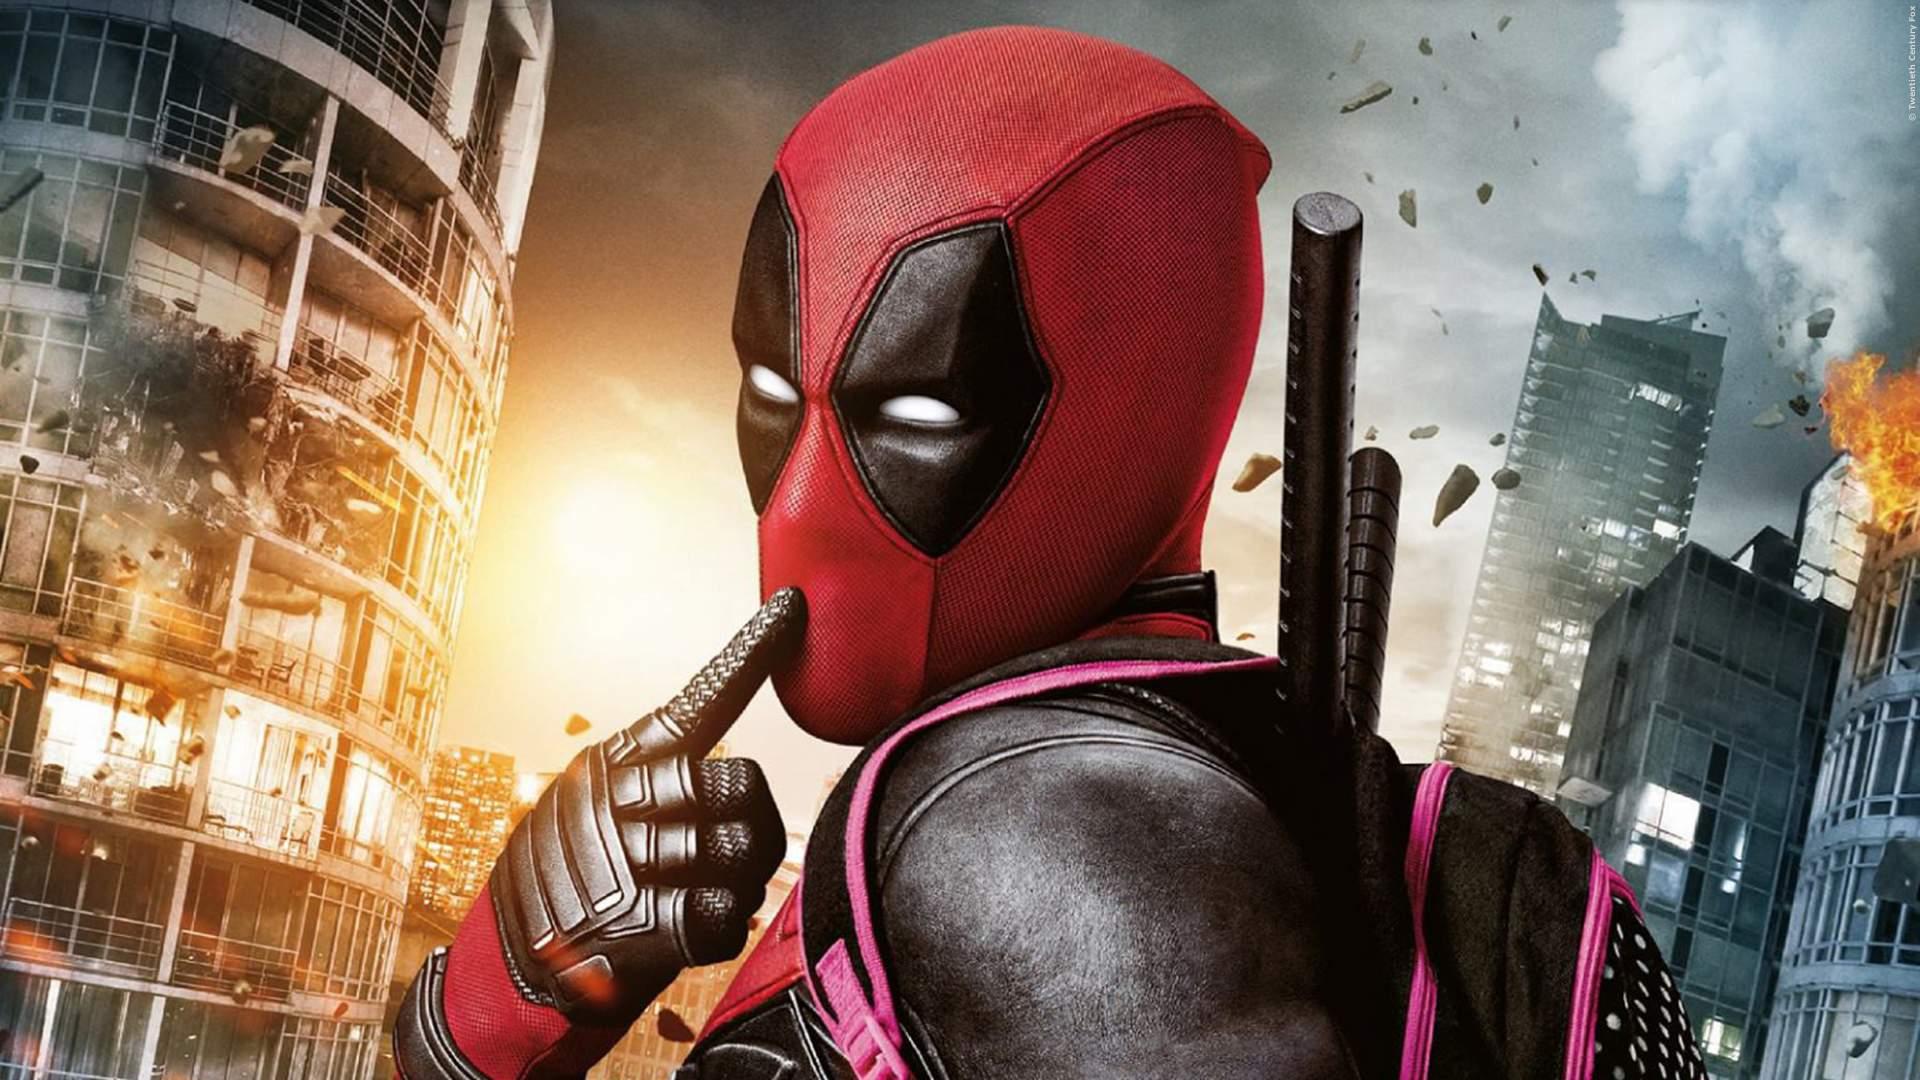 GERÜCHT: Dann trifft 'Deadpool' die 'Avengers' - Ryan Reynolds hat verraten